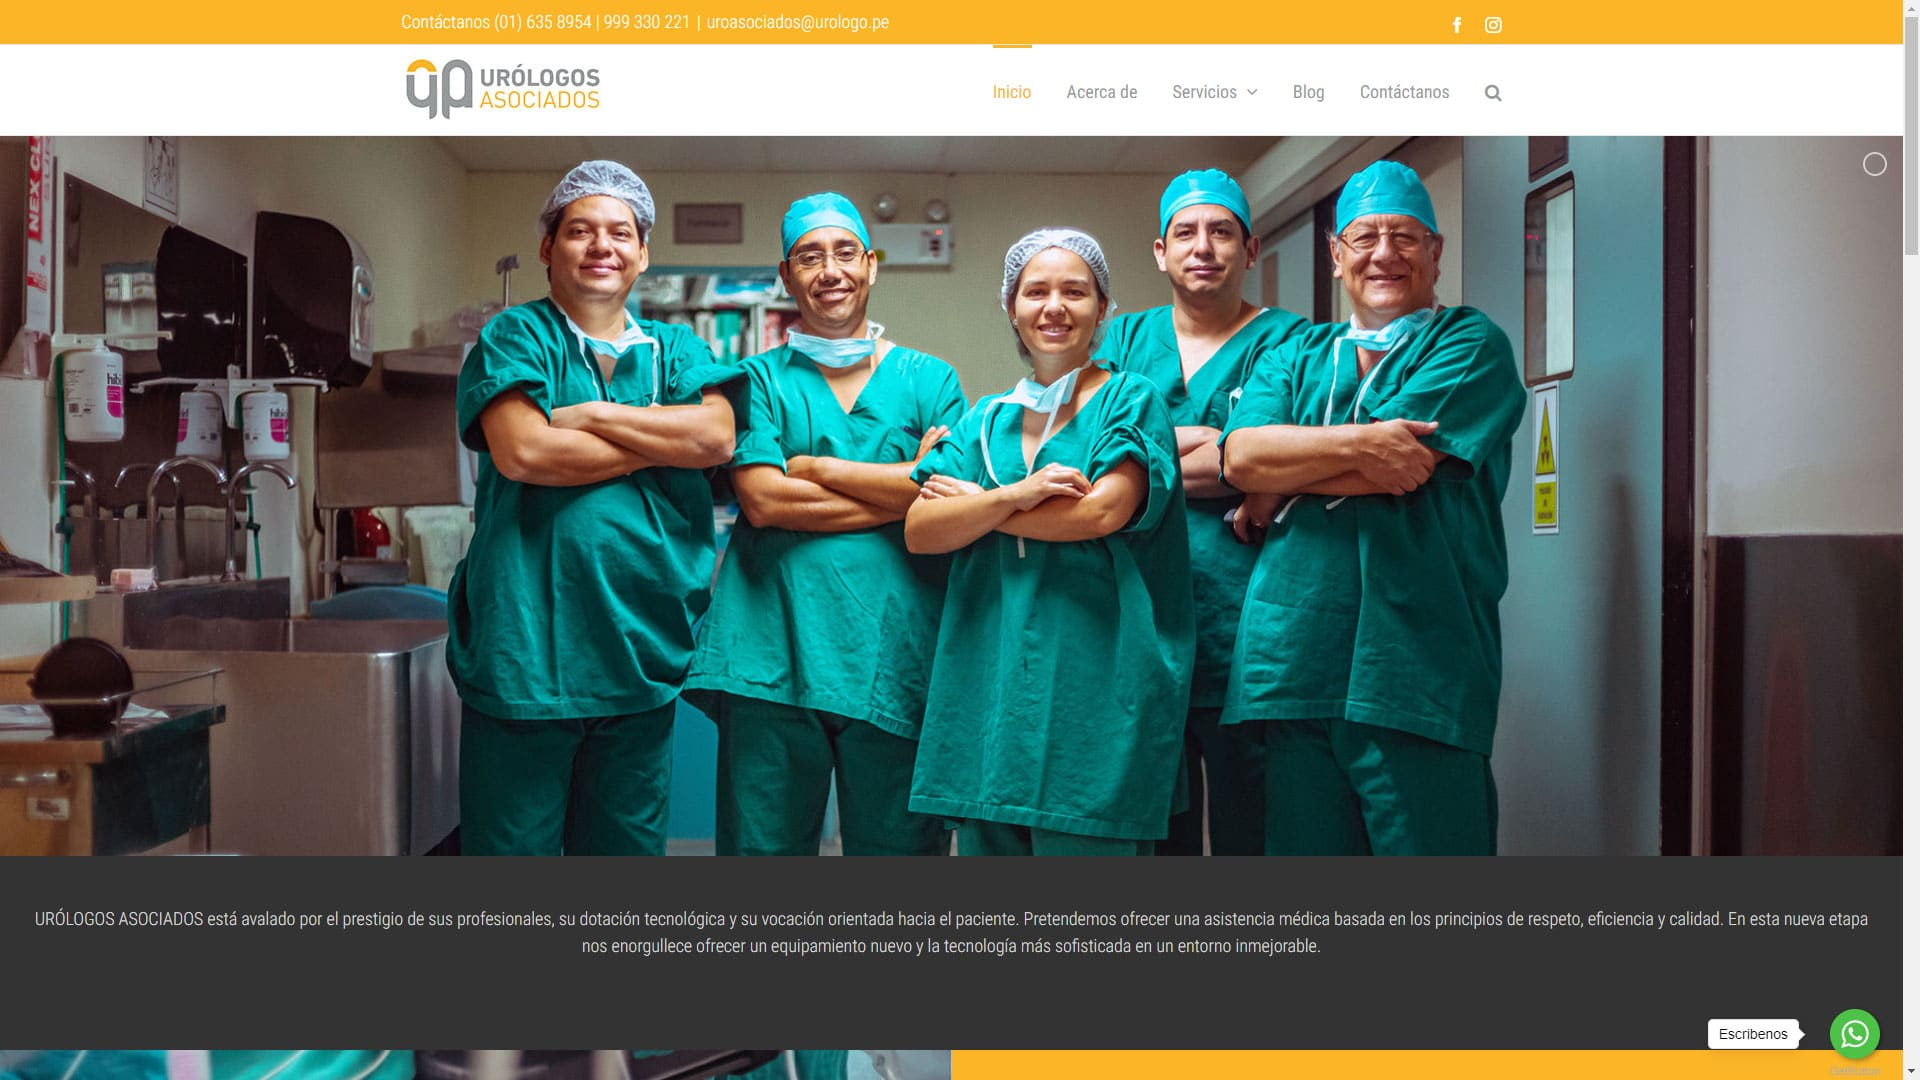 Captura de pantalla de la web urologo.pe